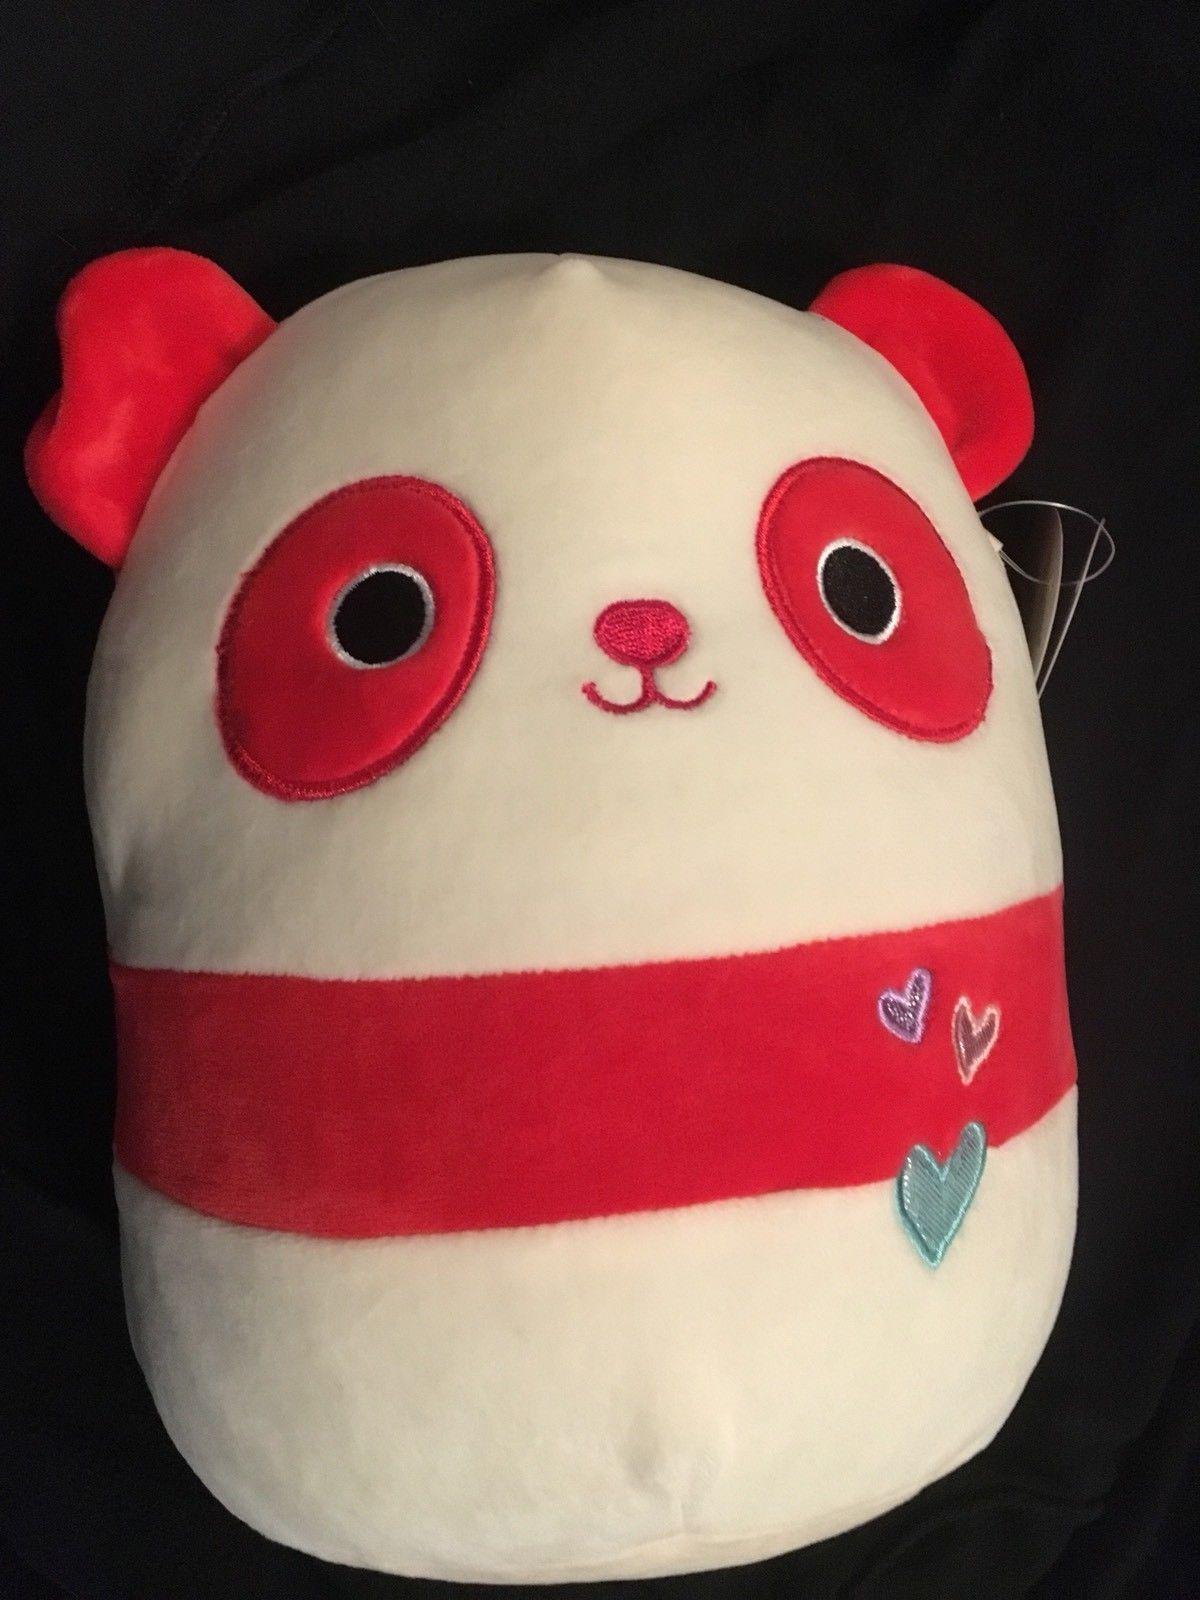 Squishmallows Penelope The Red Panda 8 Limited Edition Super Soft Plush Red Panda Soft Plush Kawaii Plush